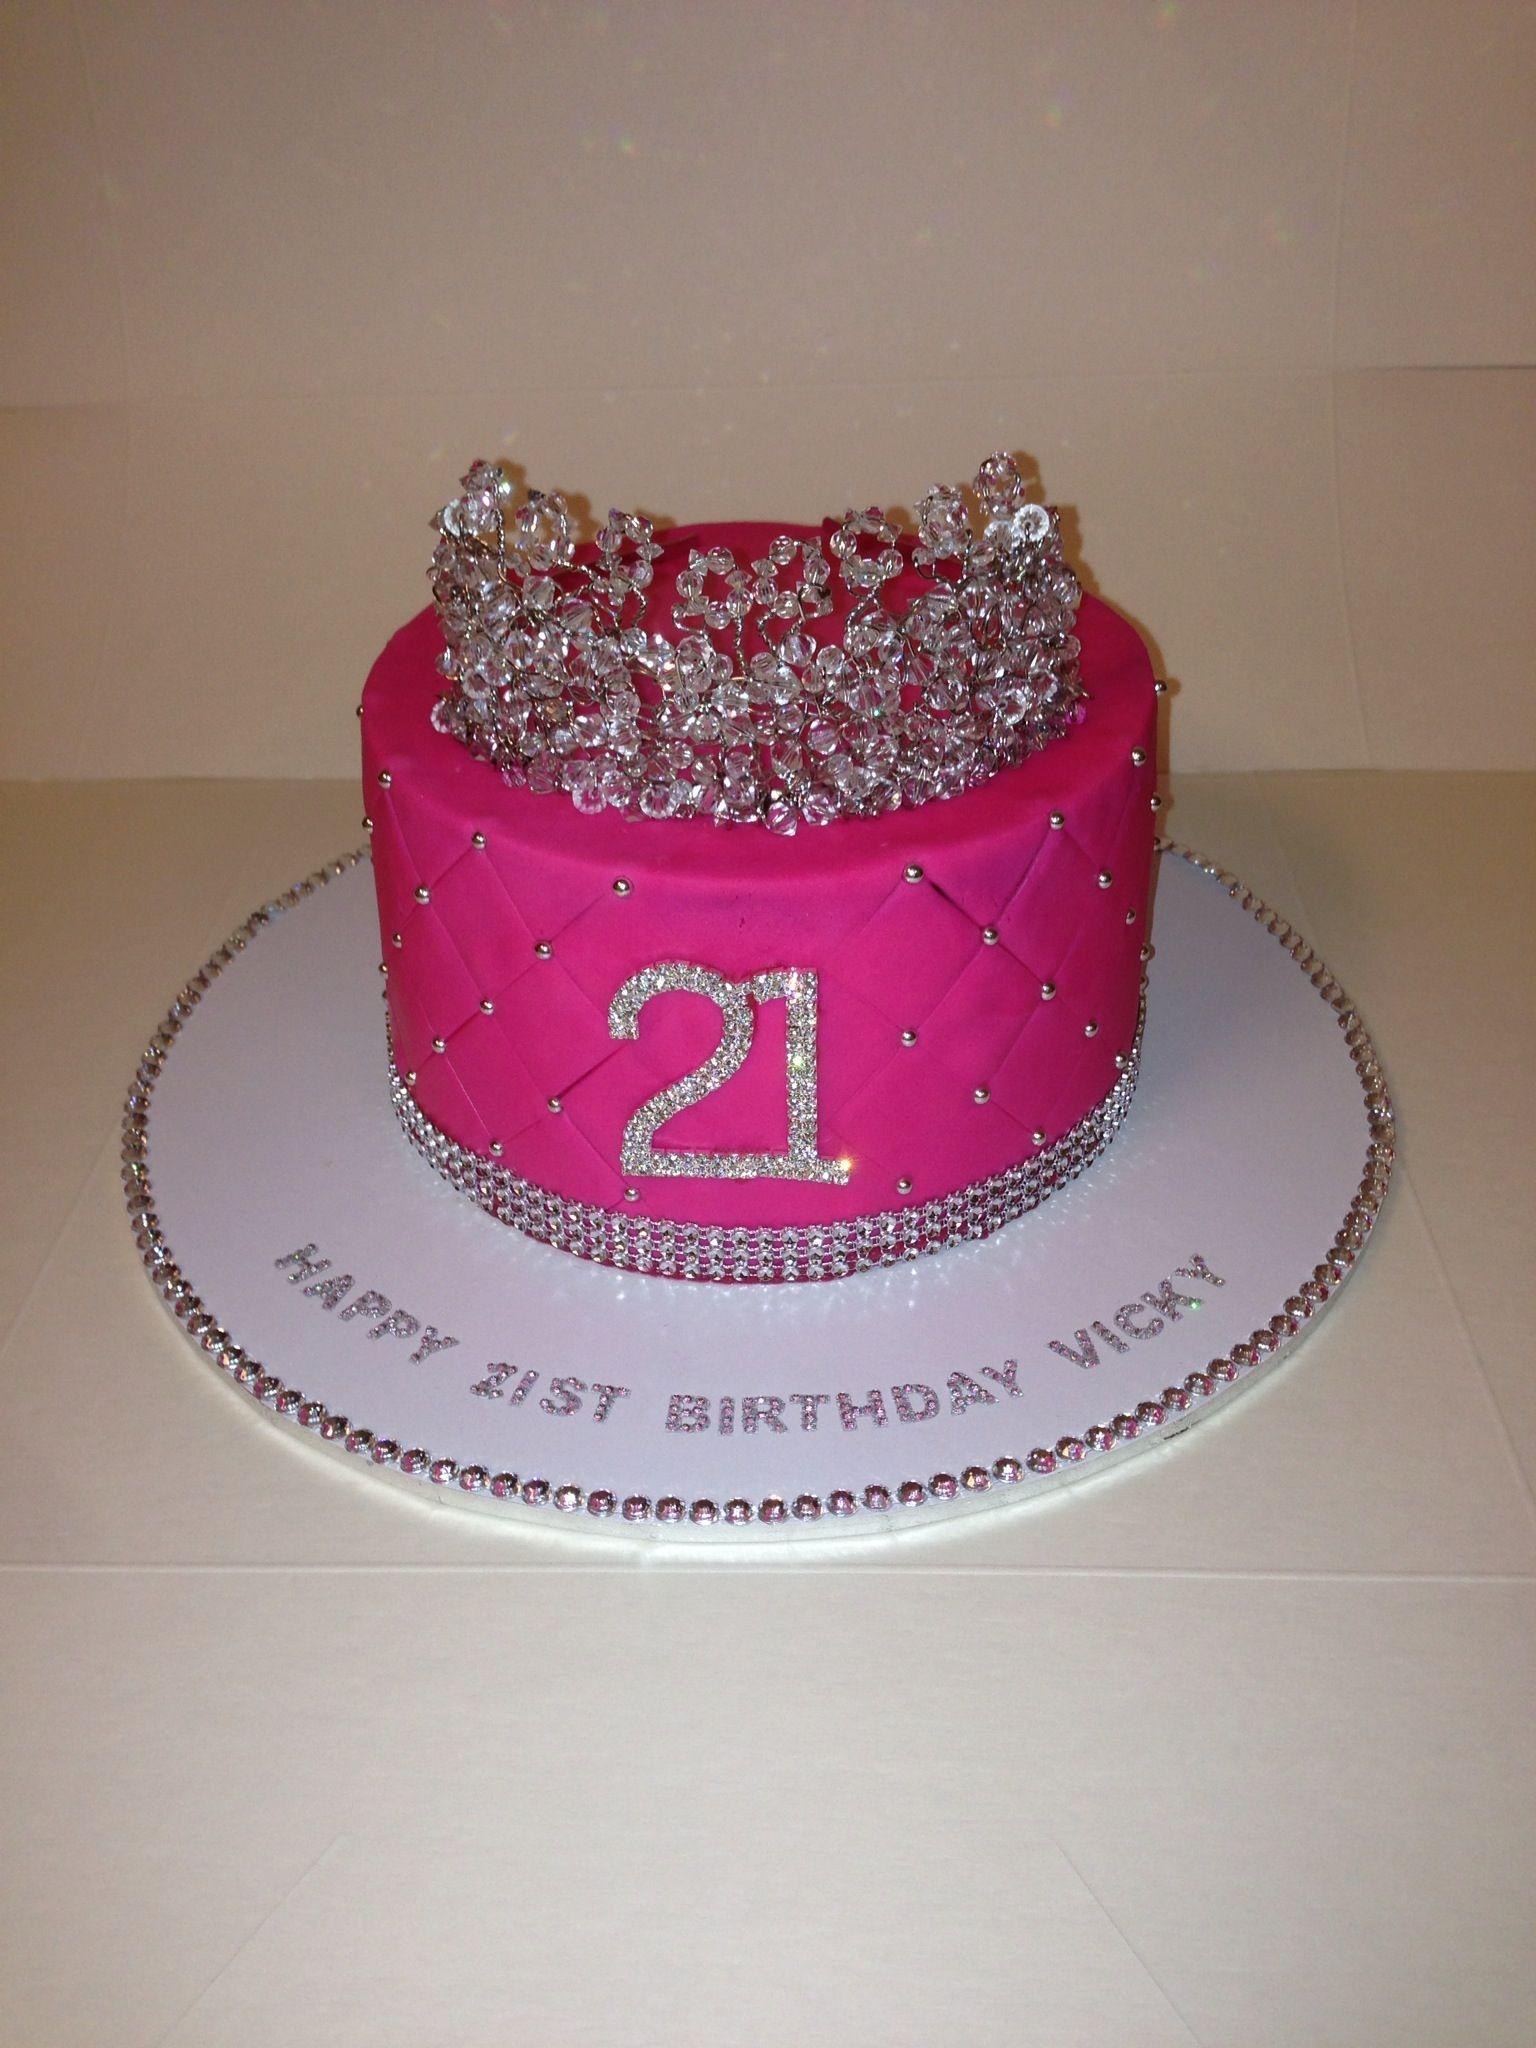 Tiara 21st Birthday Cake